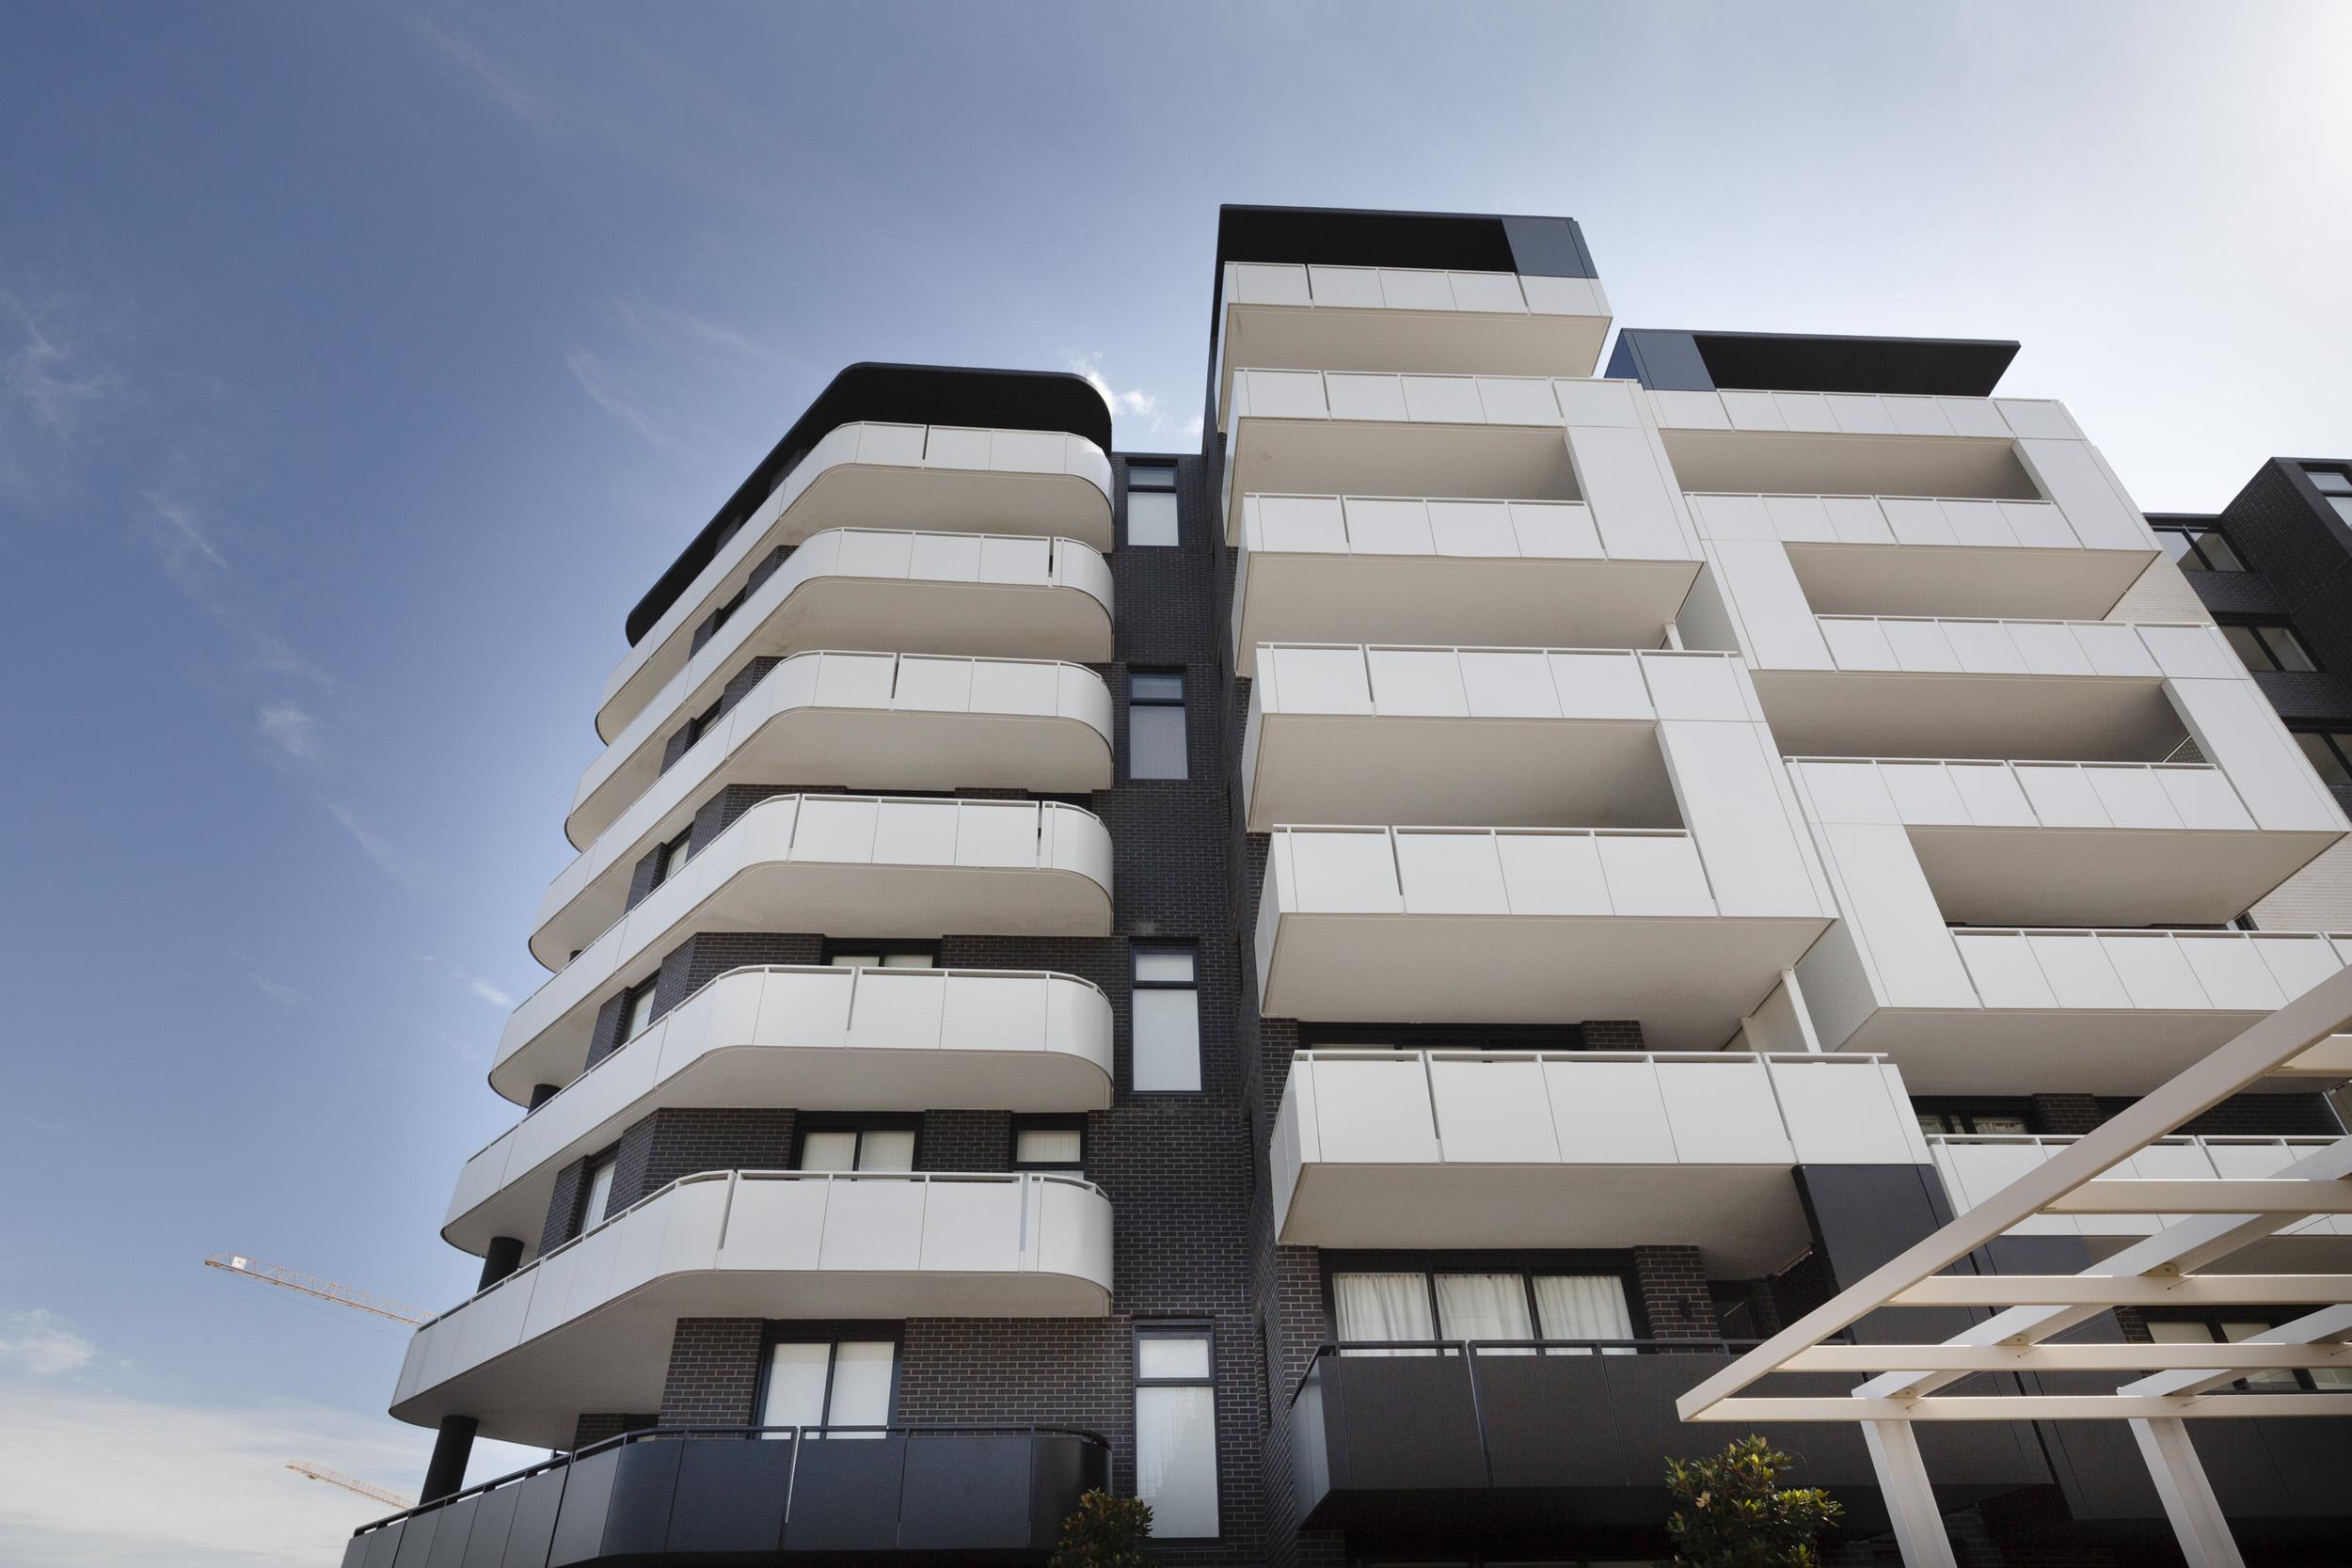 architecture_photography_sydney_australia_31.jpg